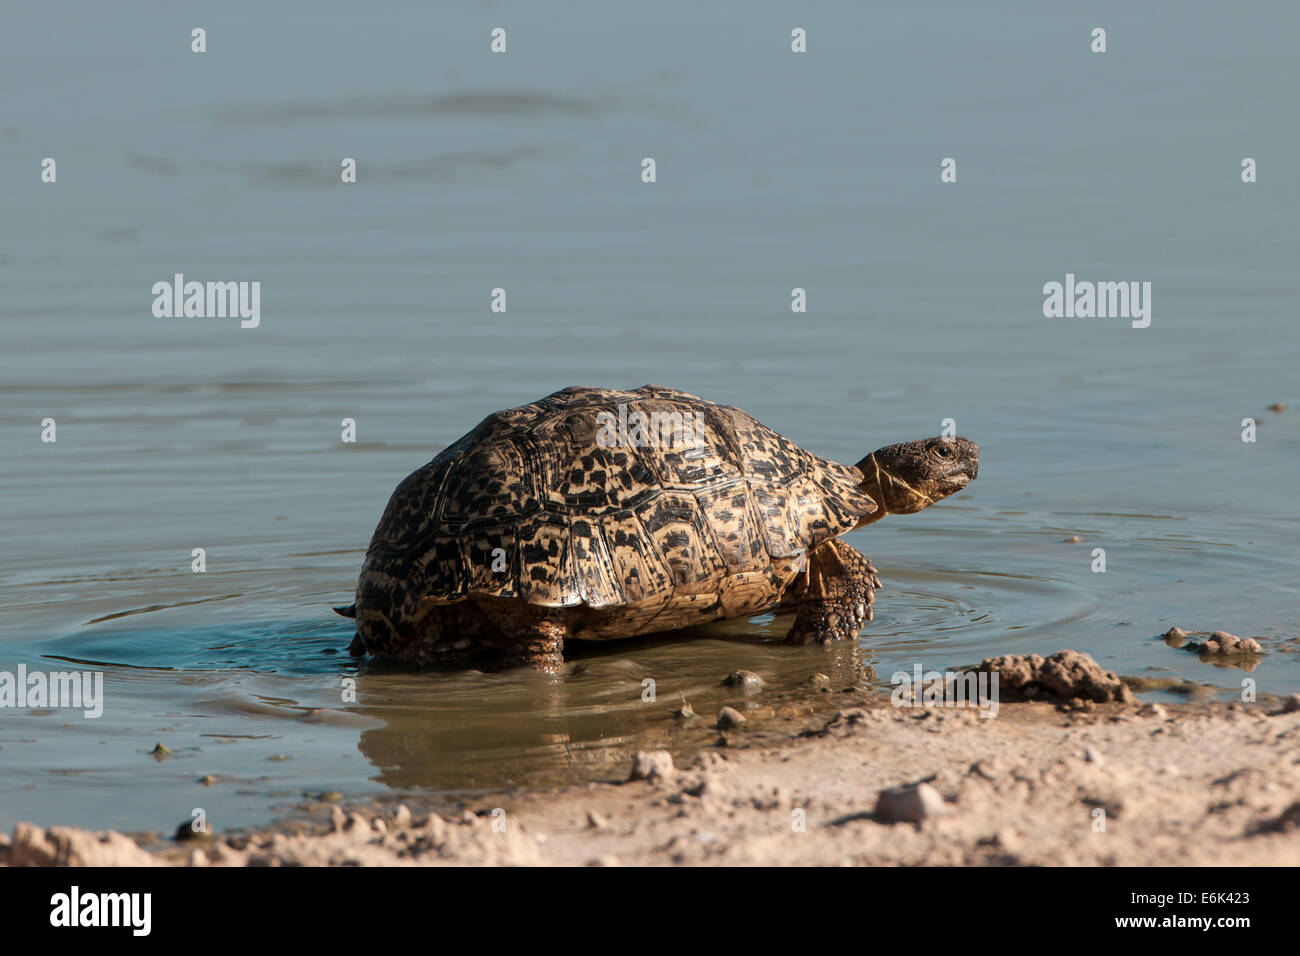 Leopard Tortoise (Geochelone pardalis), Kgalagadi Transfrontier Park, Northern Cape, South Africa Stock Photo